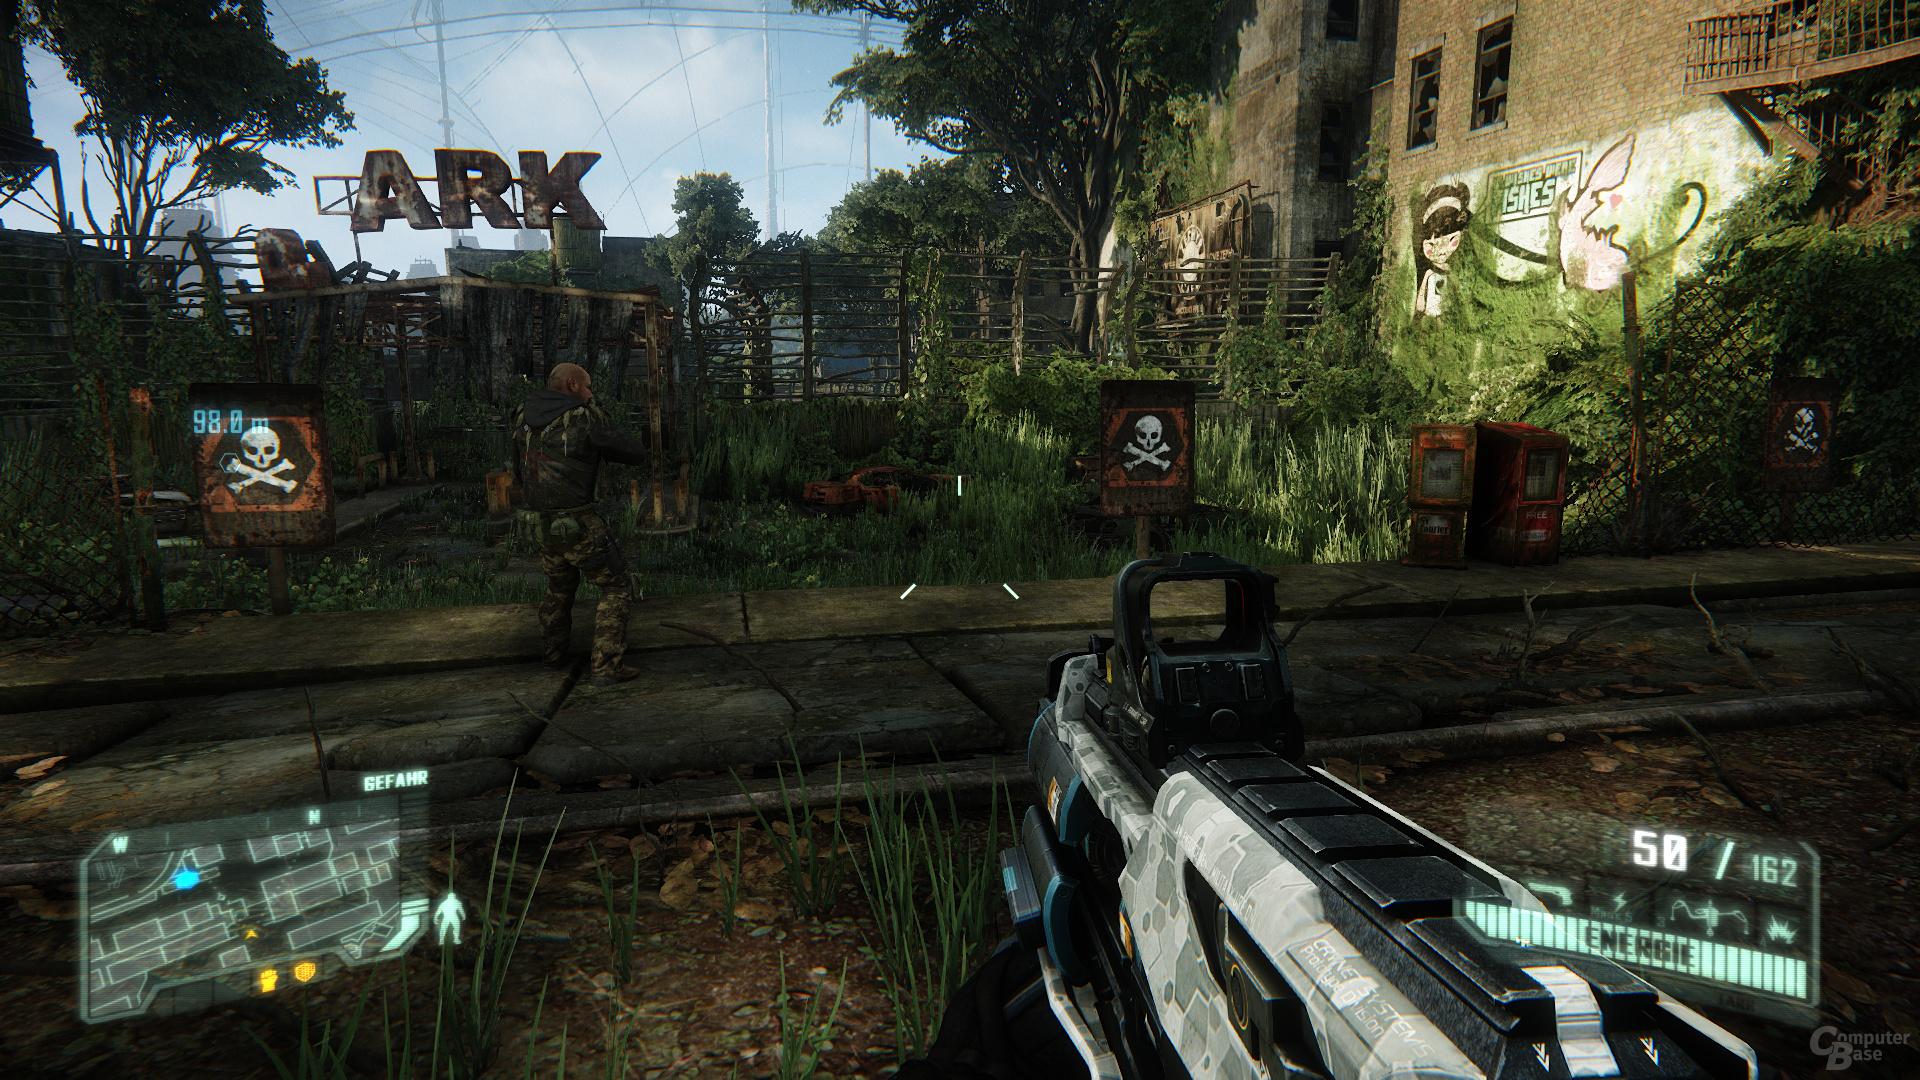 Crysis 3 - FXAA